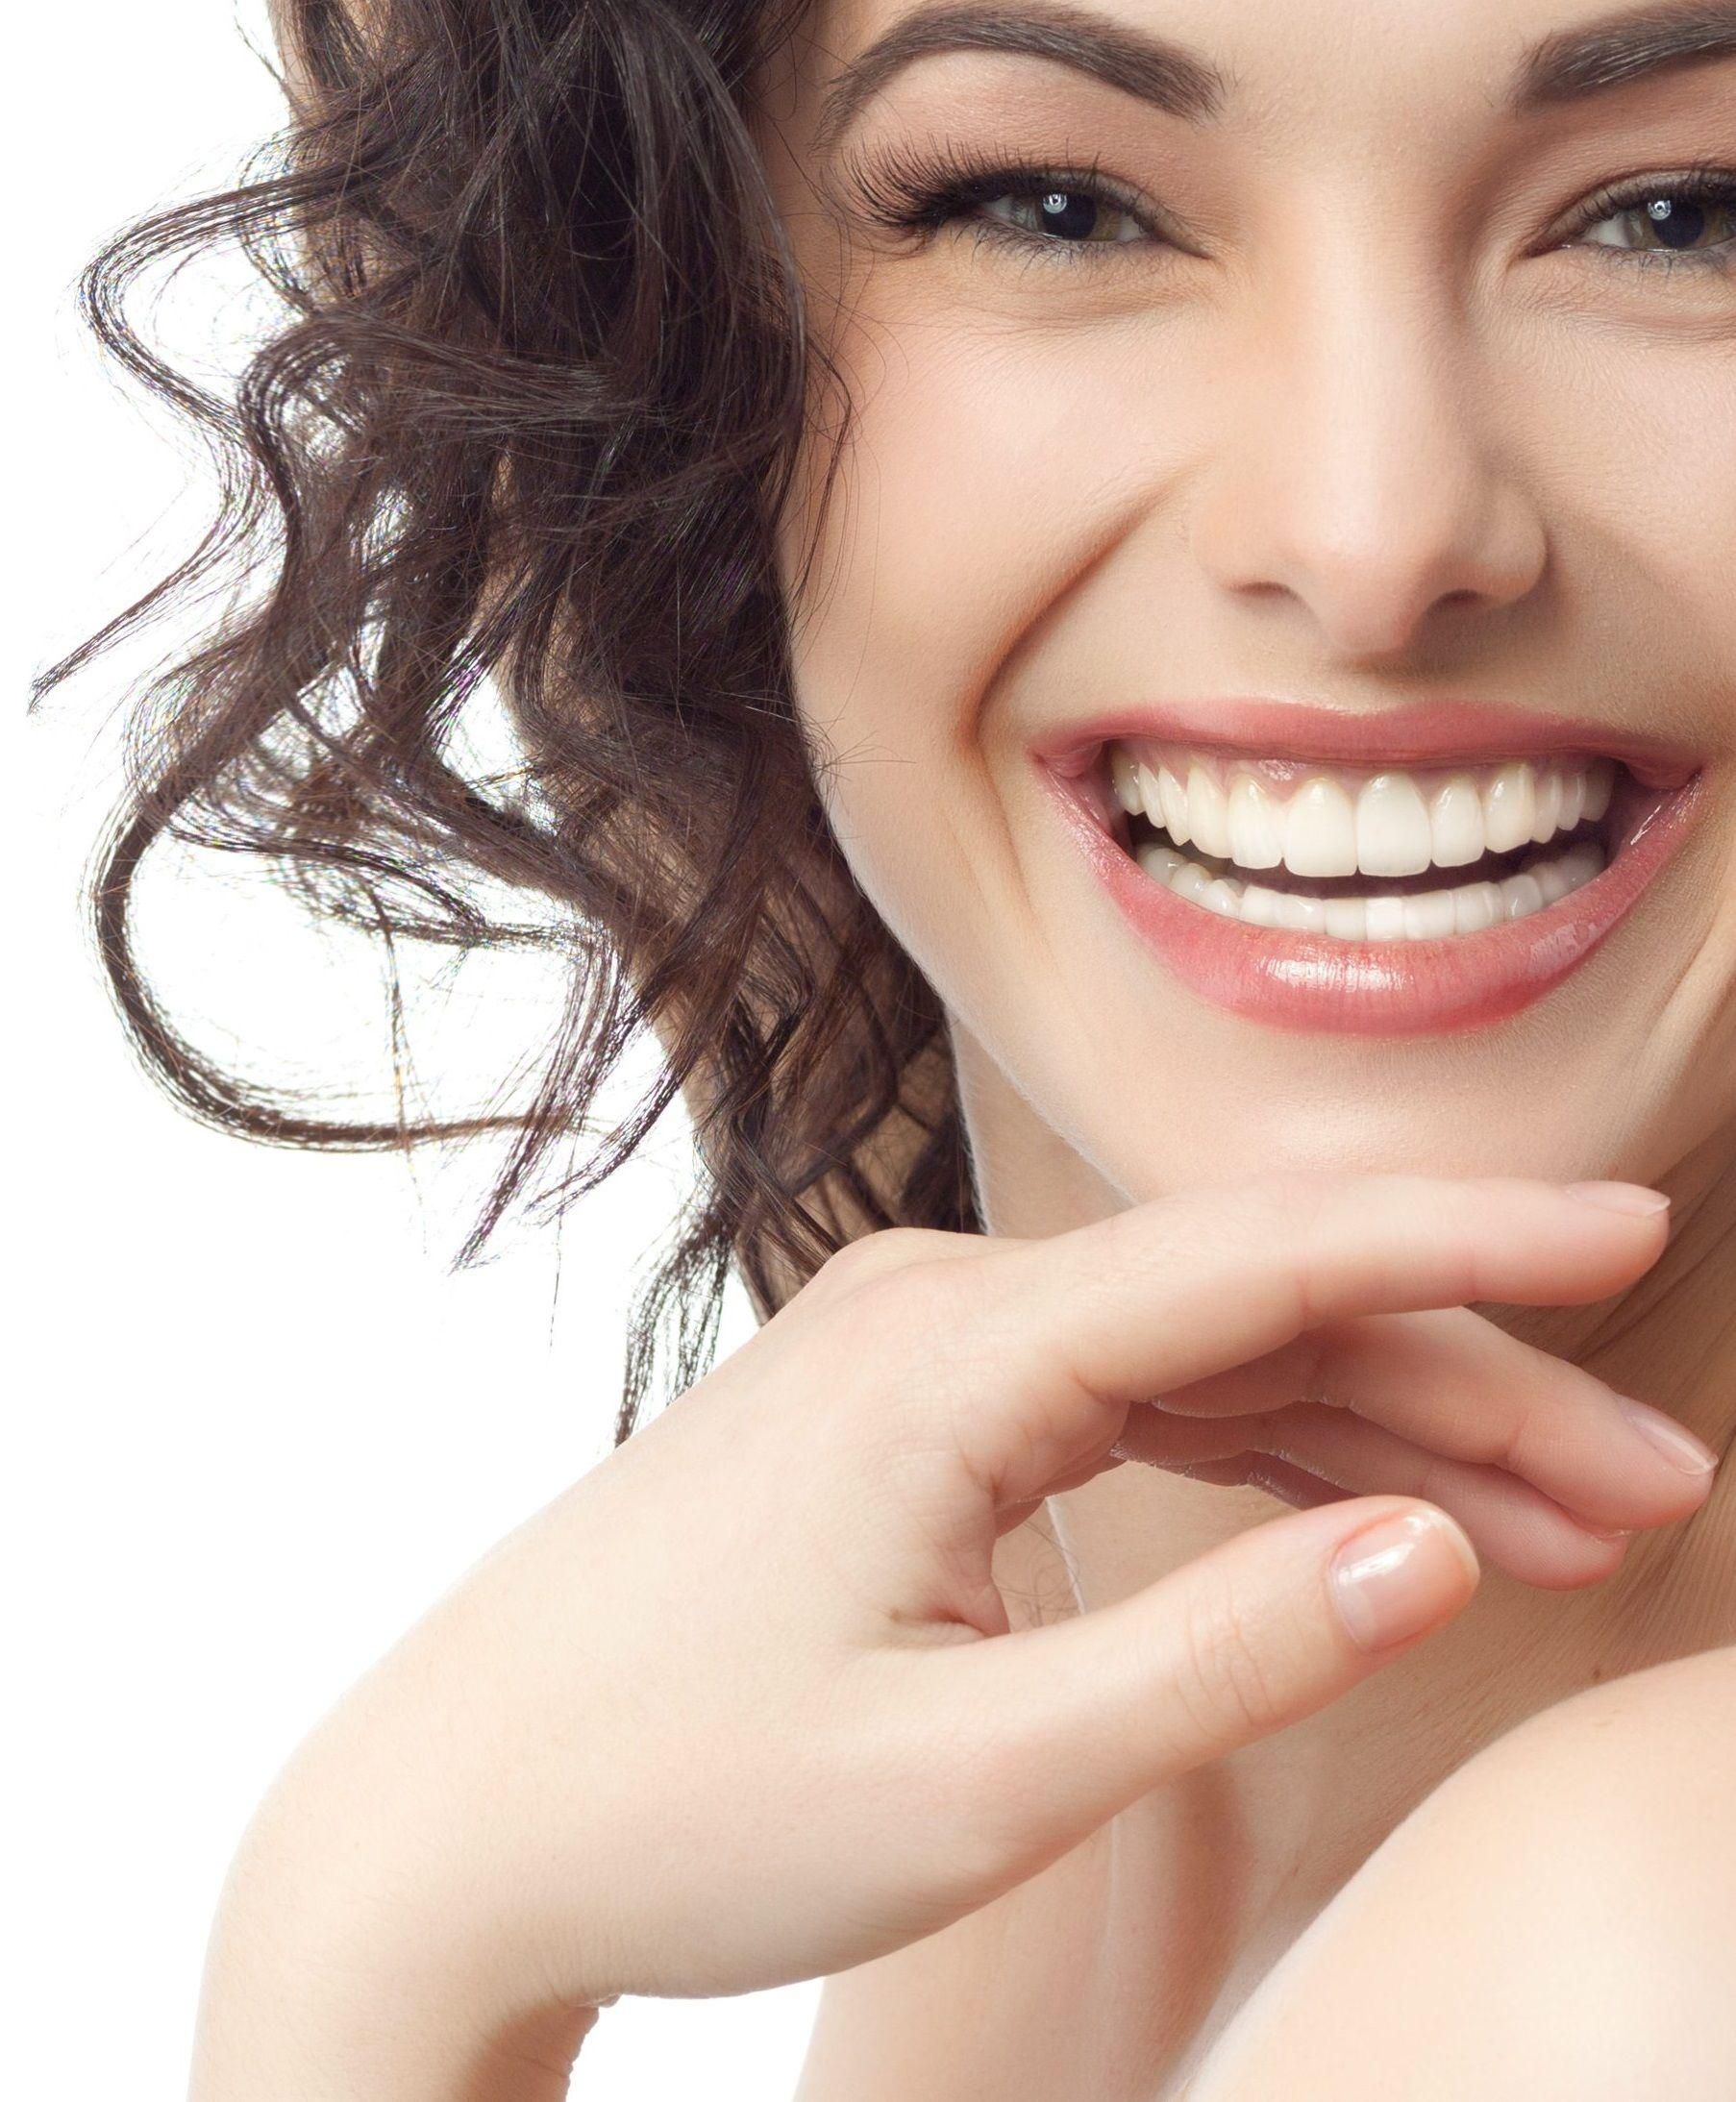 Улыбка с зубами красивыми картинка